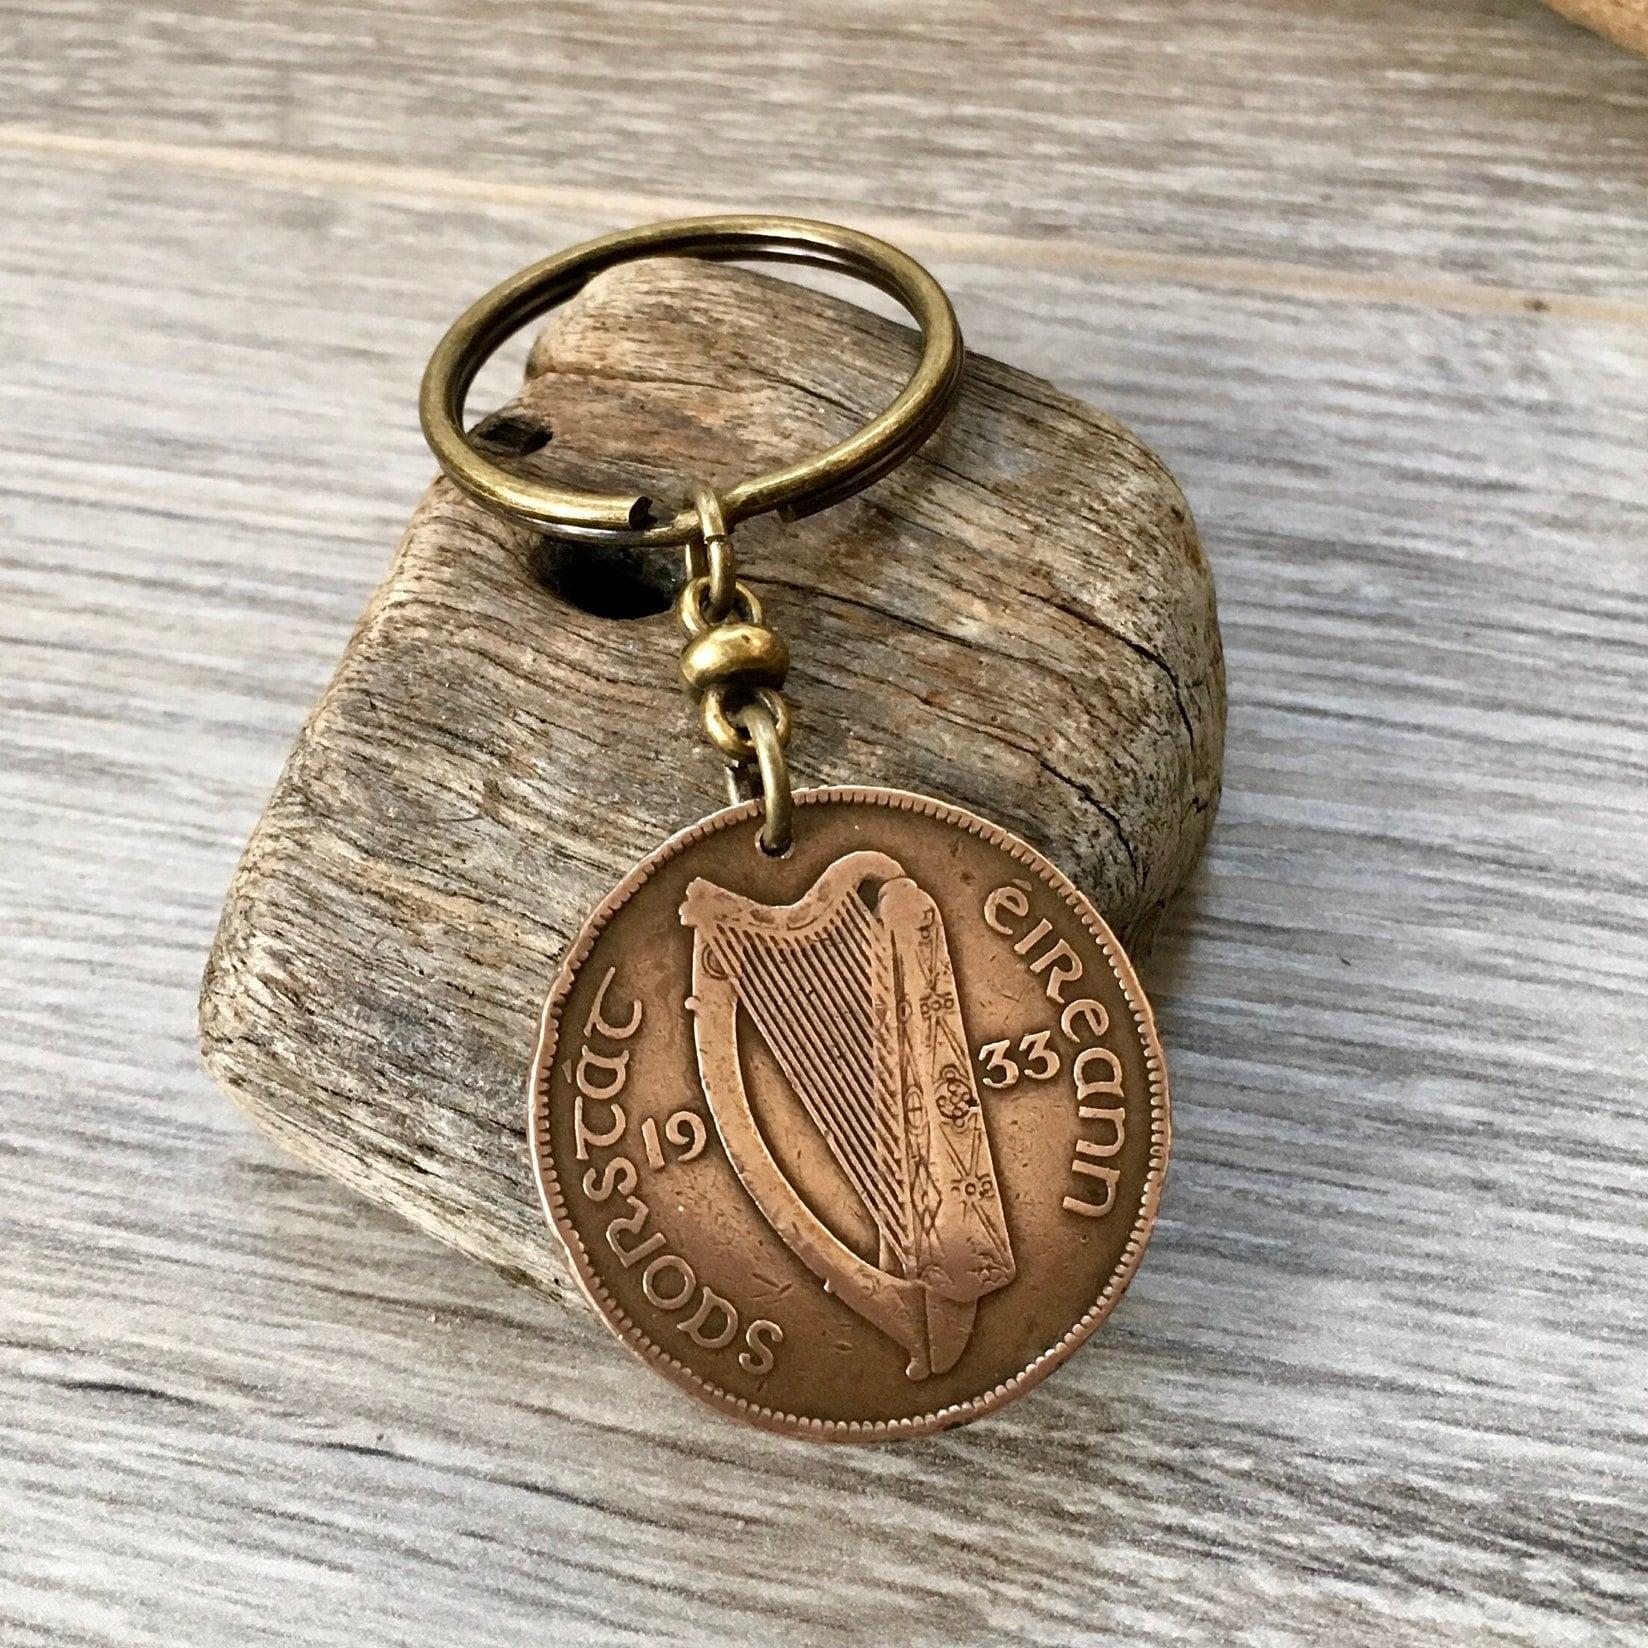 Birthday Gift Coin Keychain Gift Ready Comes in Gift bag Handbag Charm 1935 Irish Penny Coin Keyring